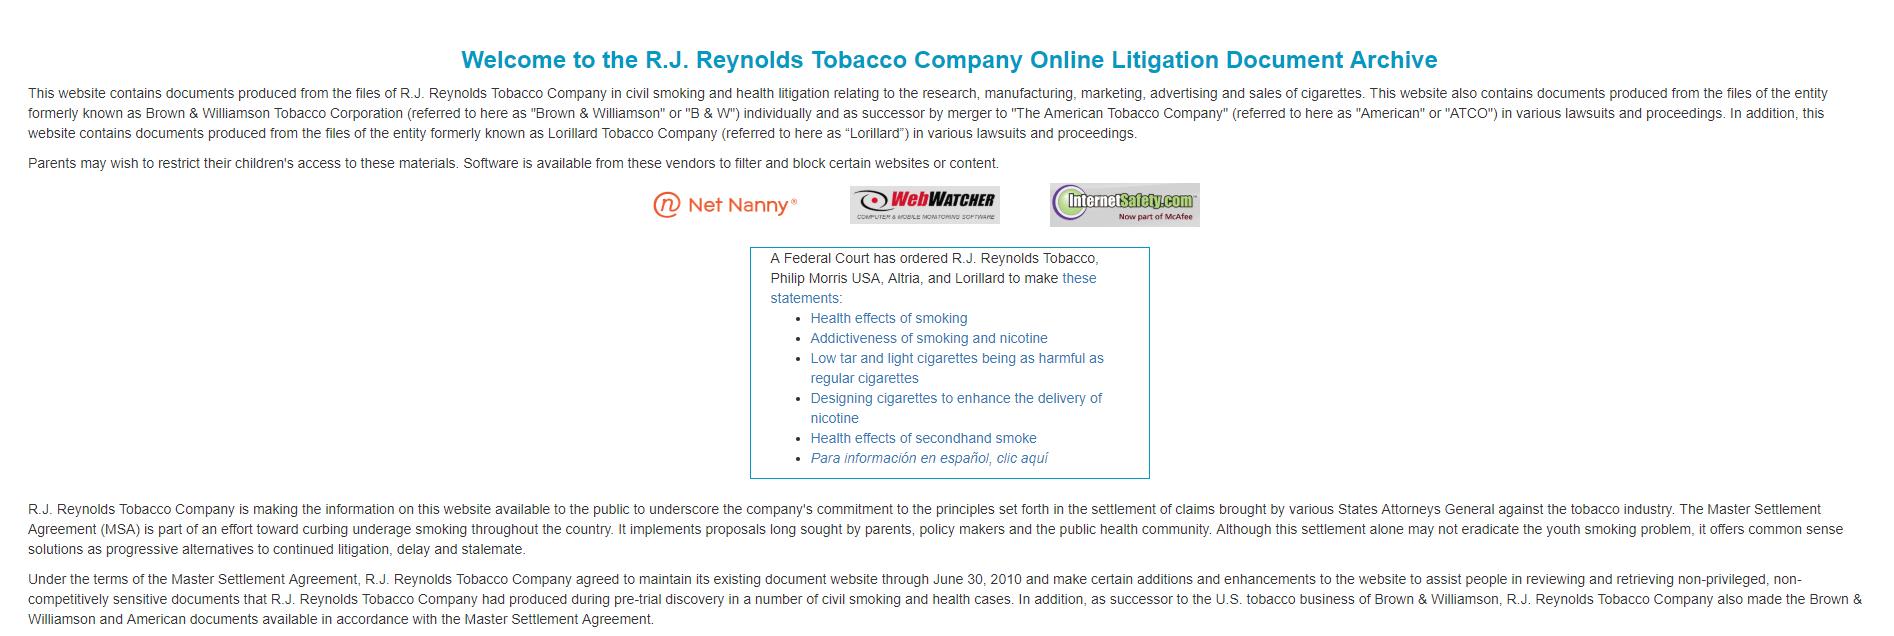 archives-RJ-Reynolds-tabac